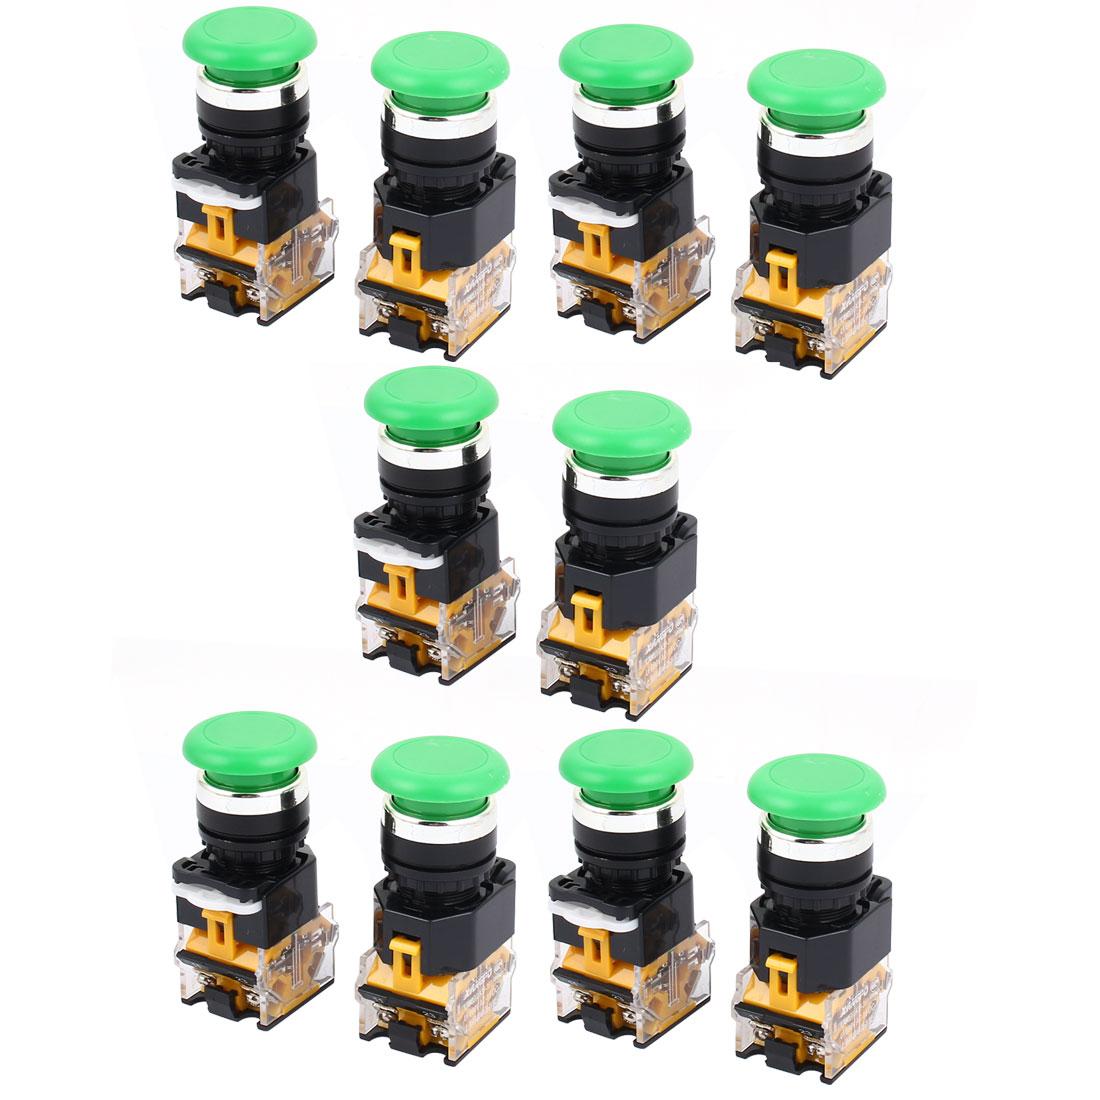 AC 660V 5A 4 Terminals NO/NC Momentary Green Push Button Switch 10PCS